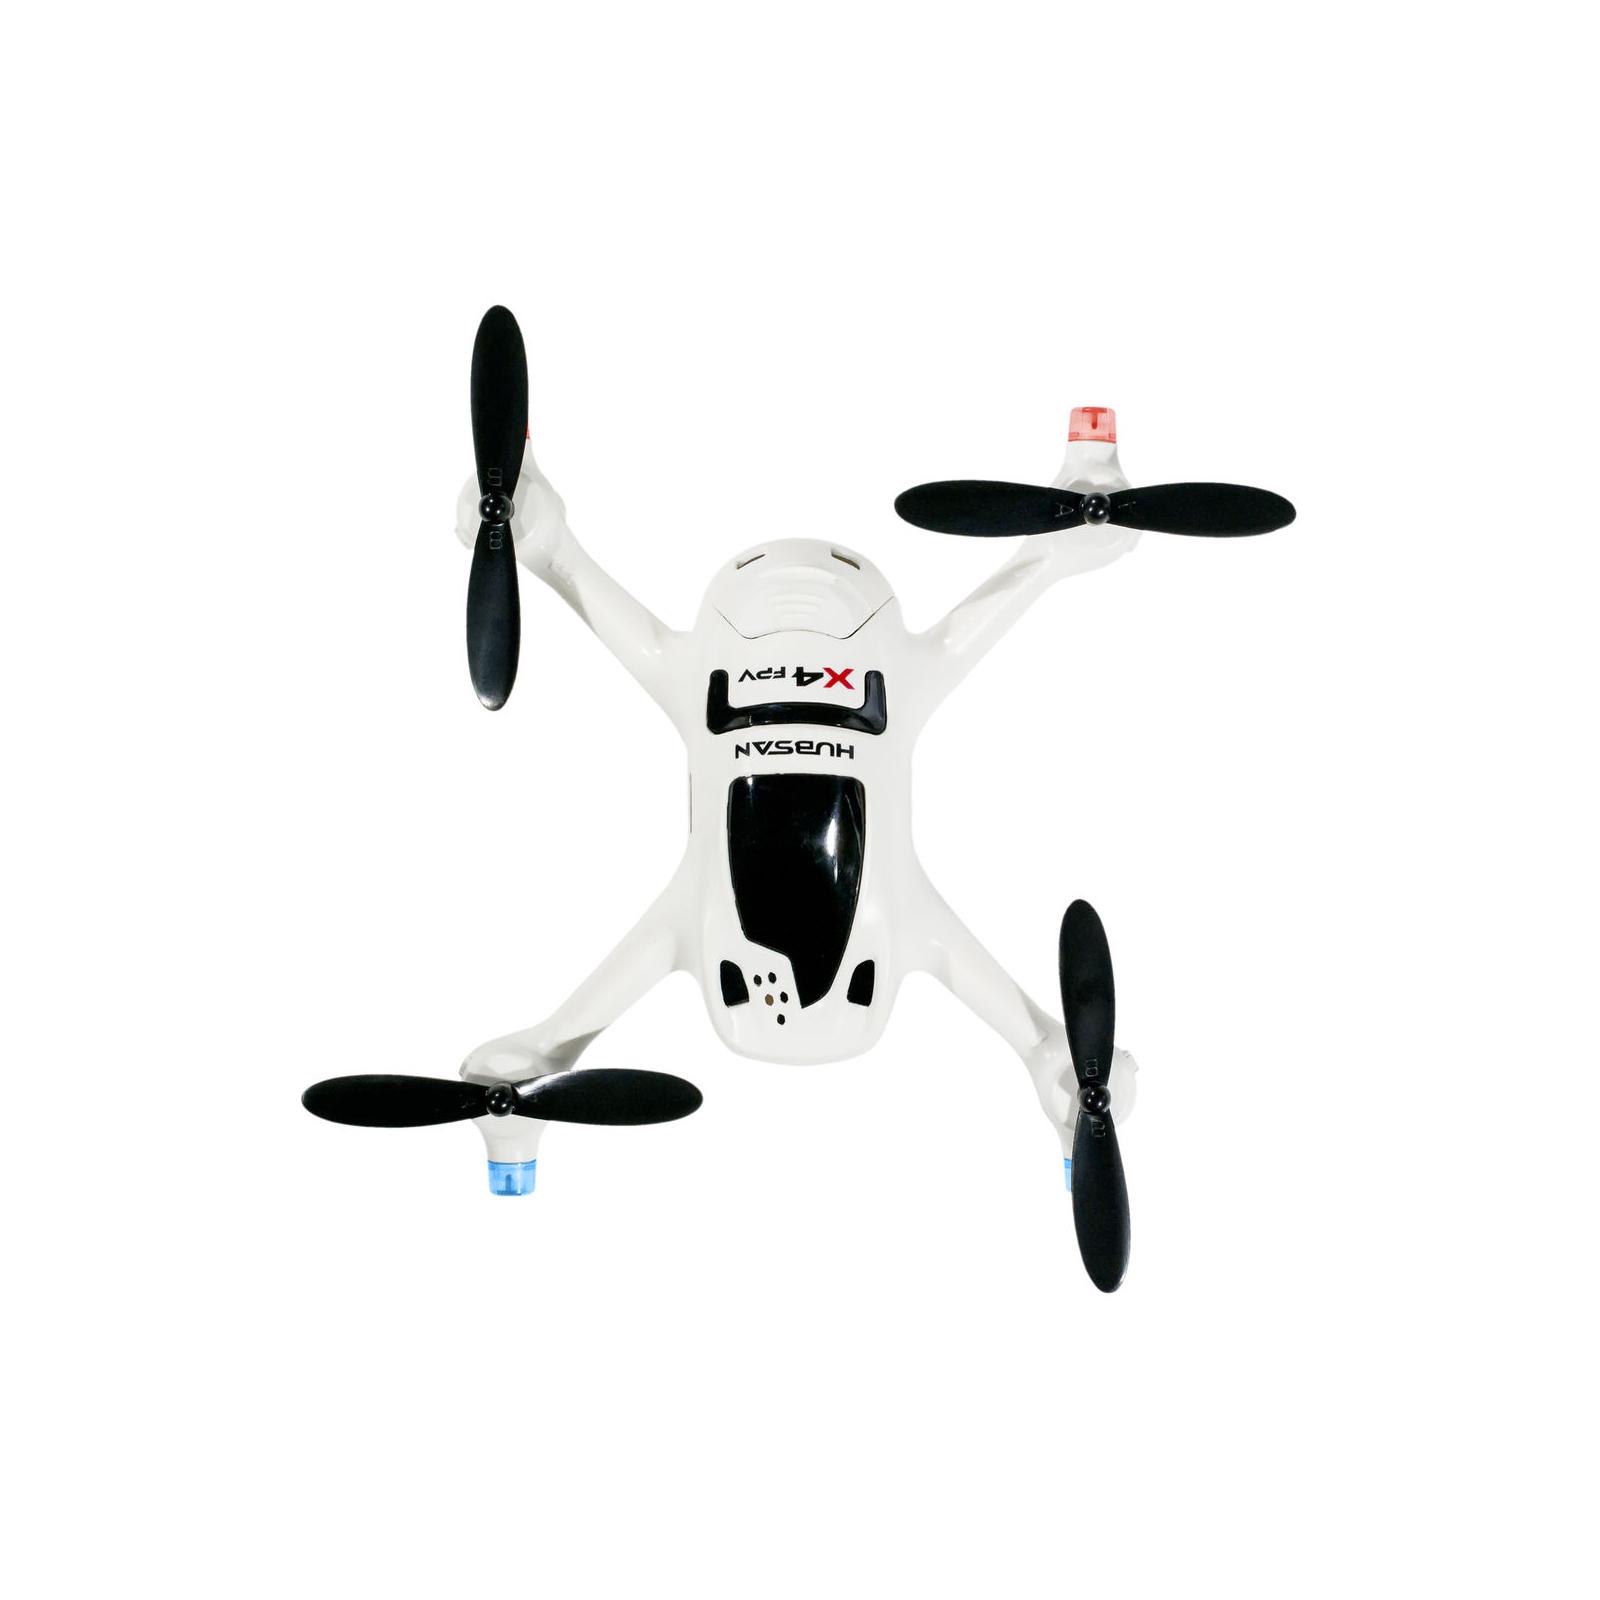 Квадрокоптер Hubsan H107D+ X4 FPV 2.4ГГц 5.8ГГц 4CH RC белый (H107D+ FPV White HD Camera) изображение 2